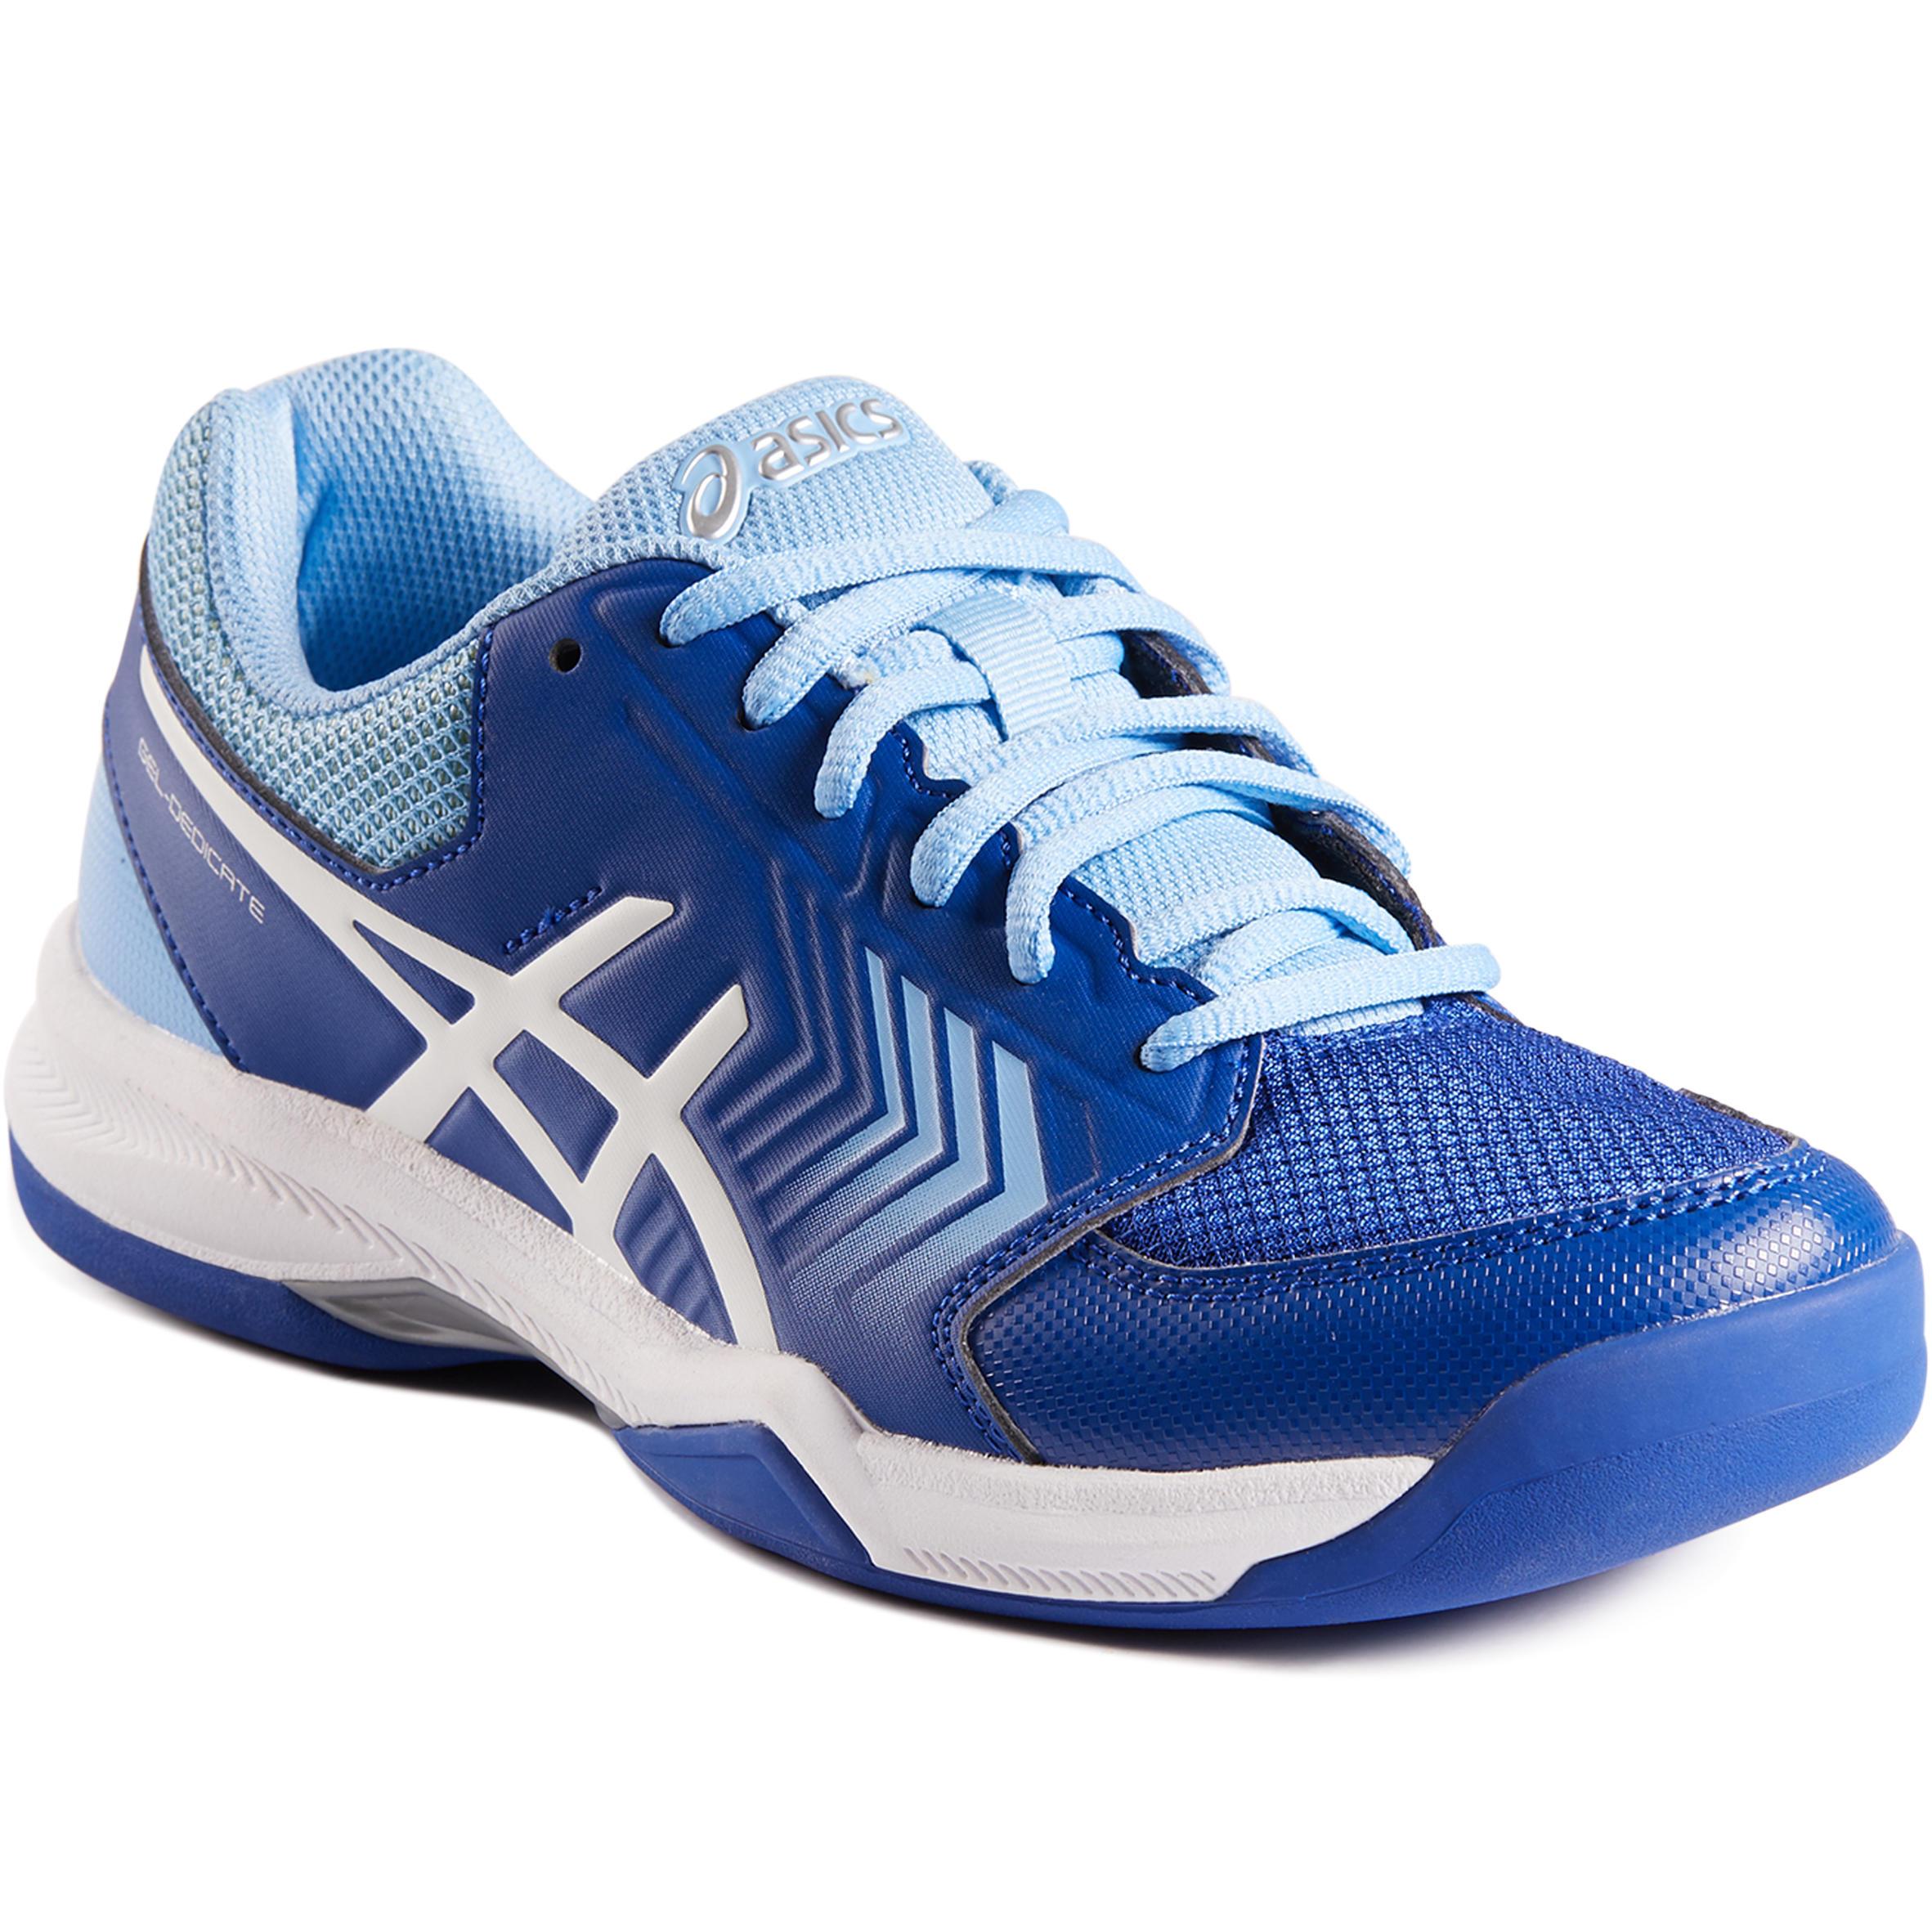 rencontrer 038bf c9caf Chaussures tennis | Decathlon